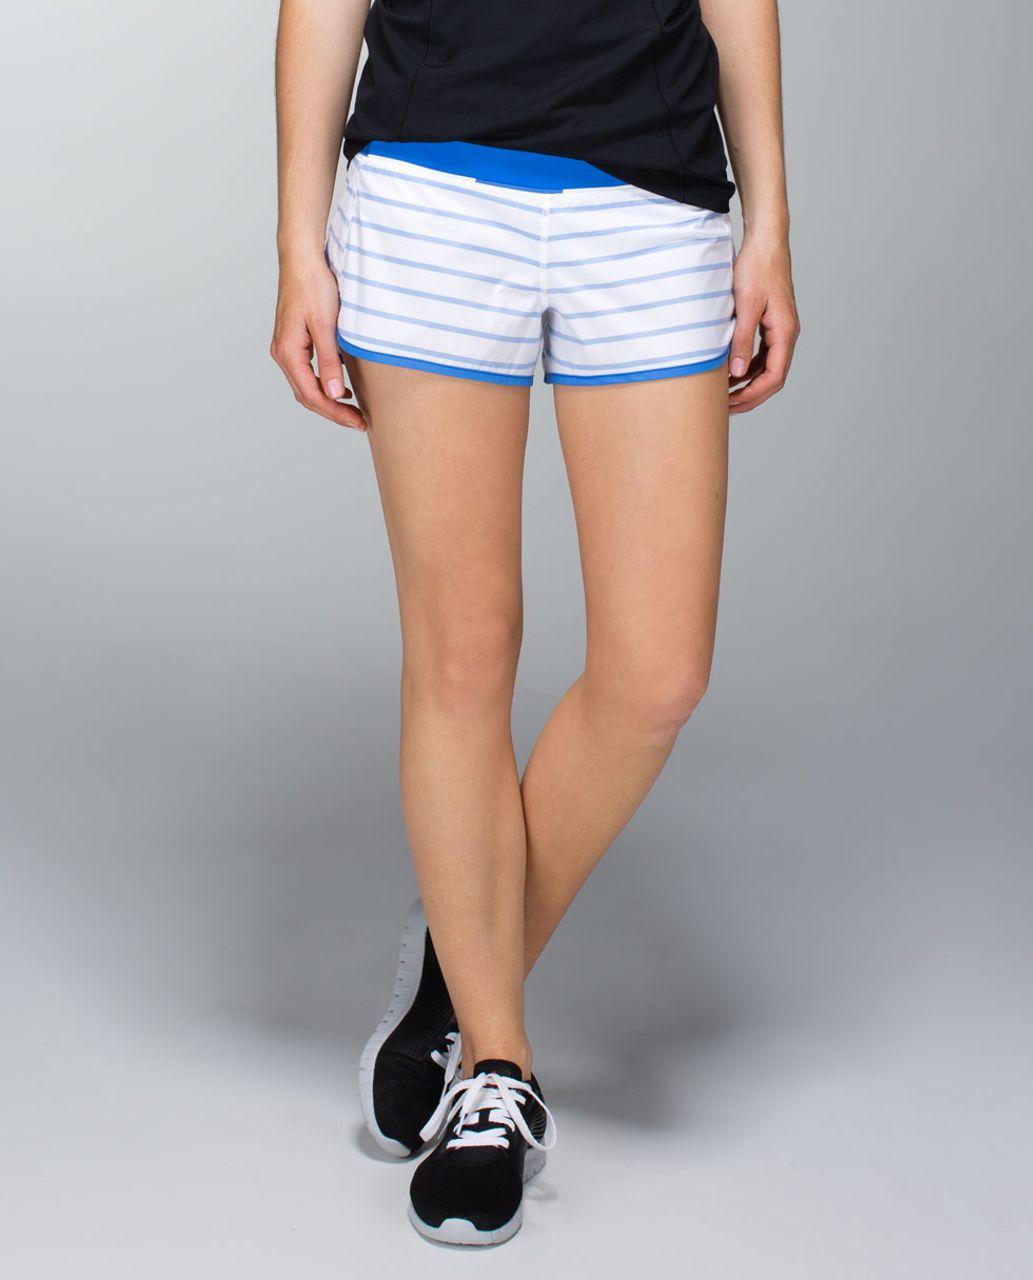 Lululemon Run:  Speed Short *2-way Stretch - Deauville Stripe Pipe Dream Blue White / Pipe Dream Blue